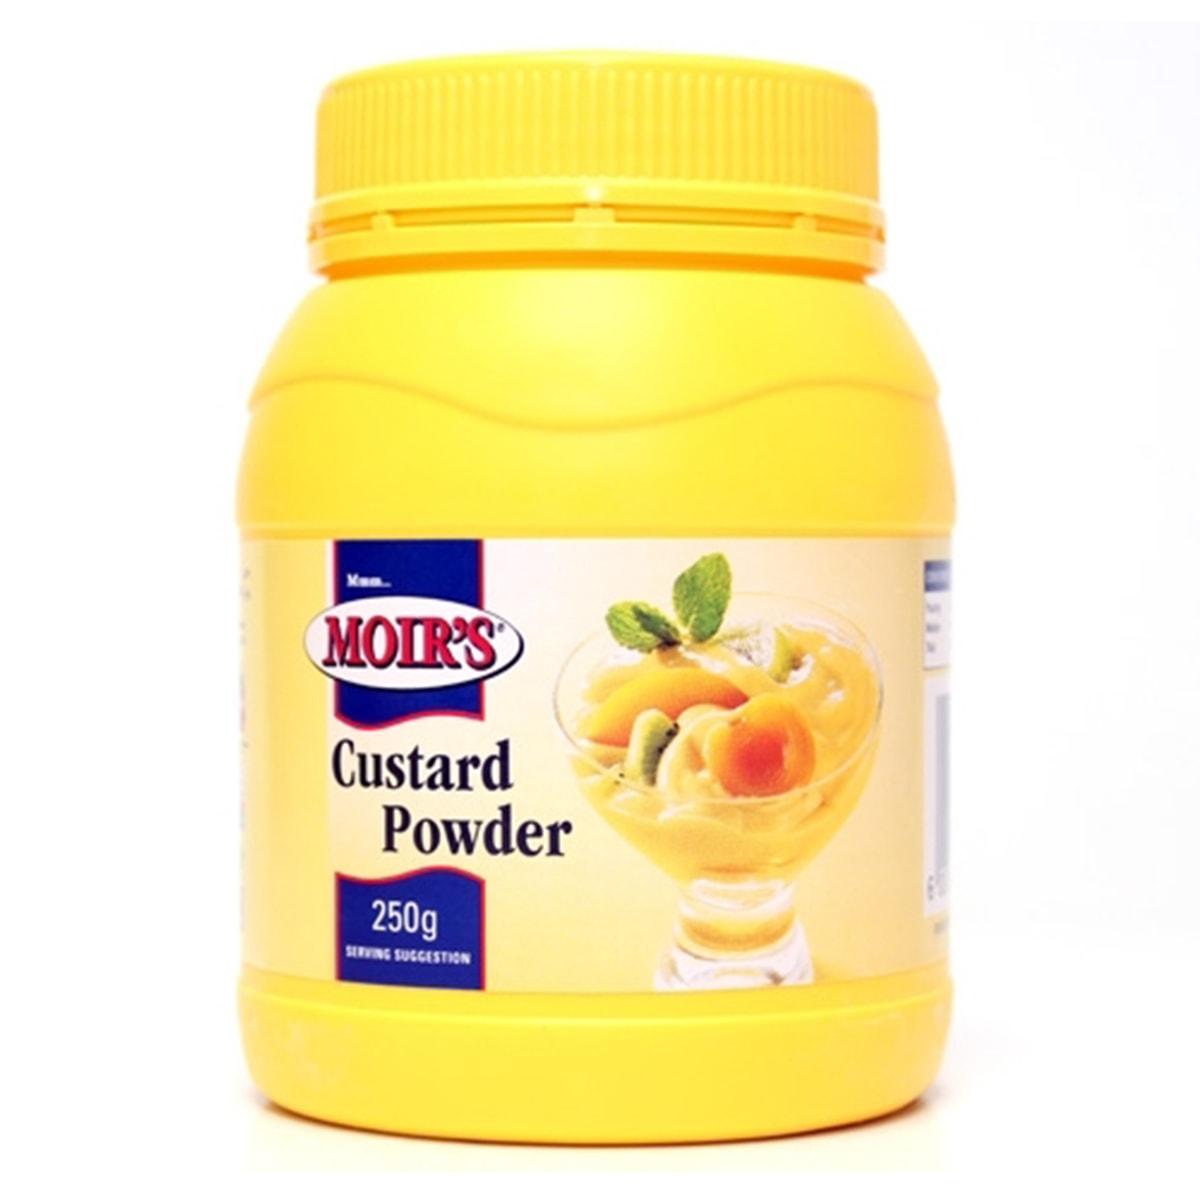 Buy Moirs Custard Powder - 250 gm